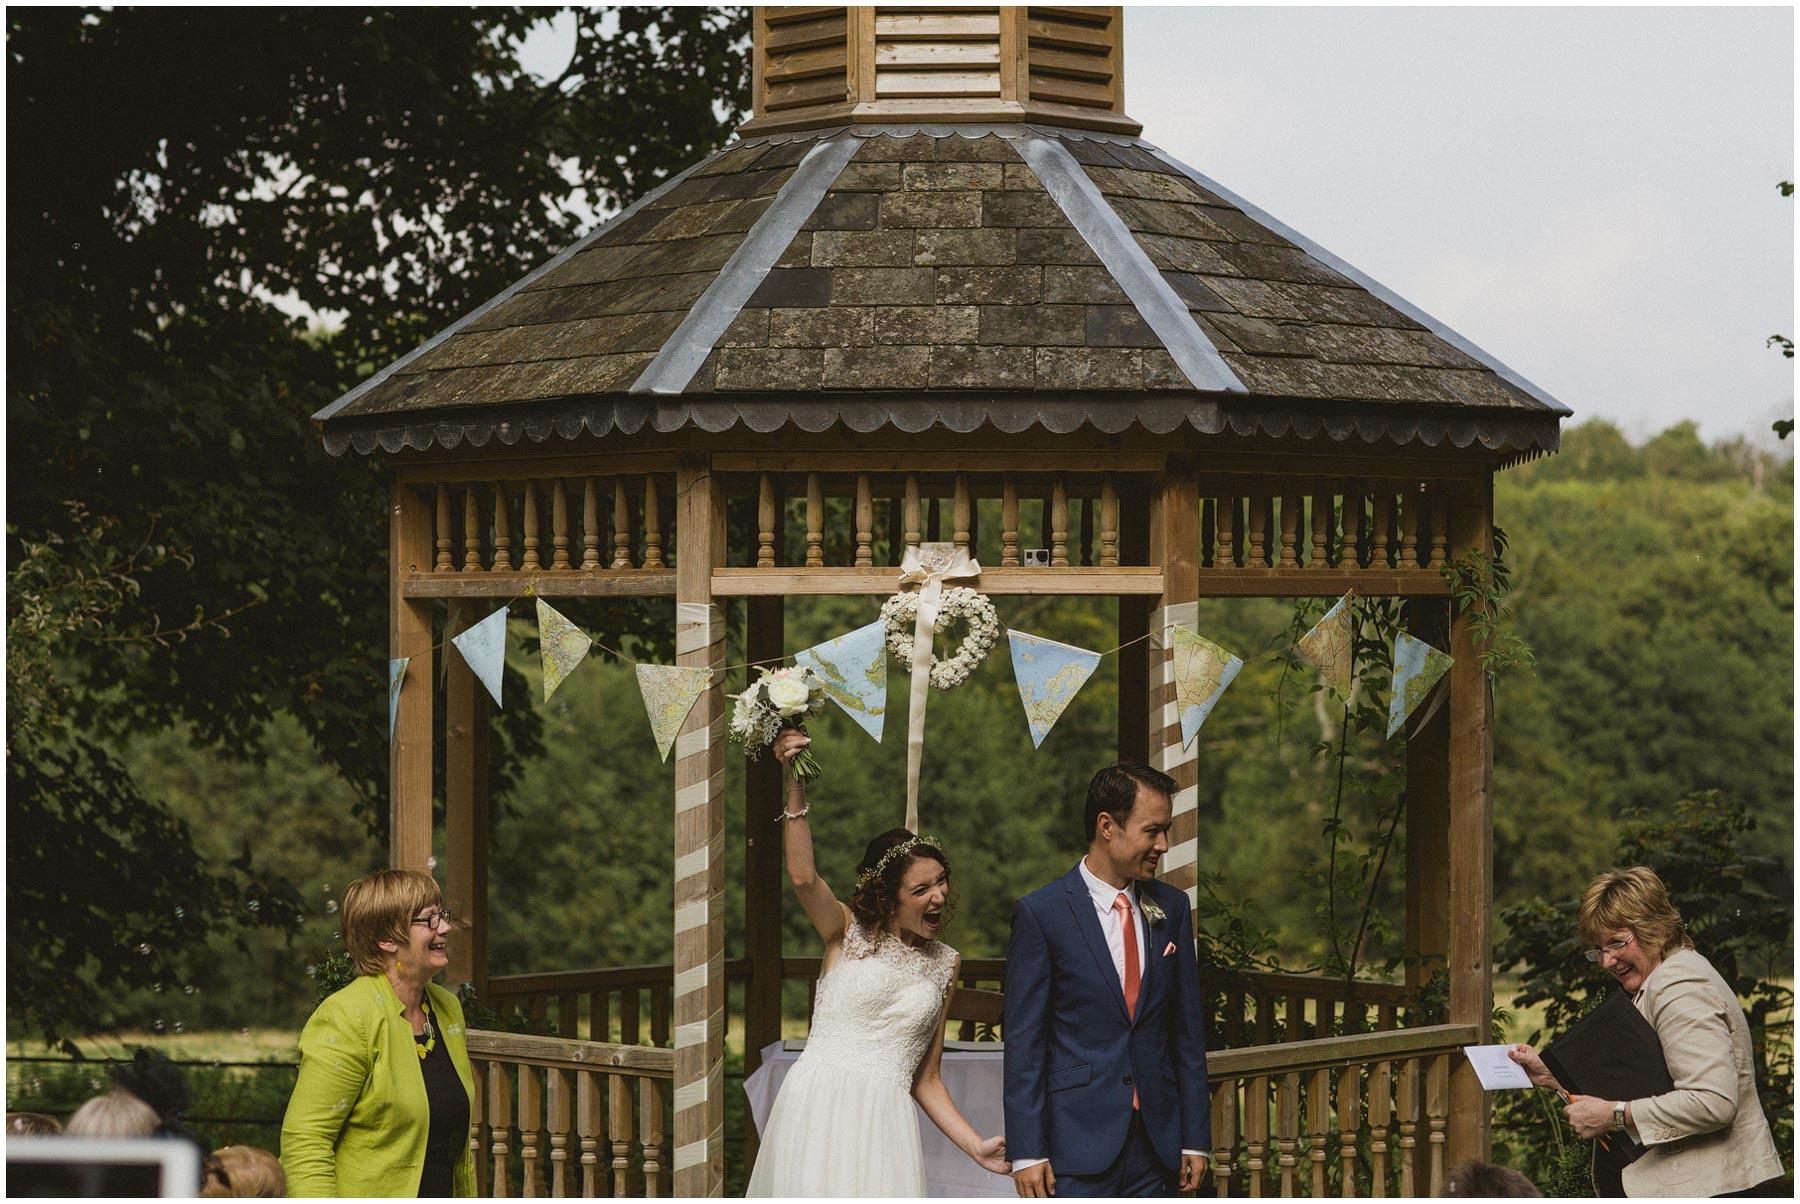 Colehayes-Park-Wedding-Photography_0092